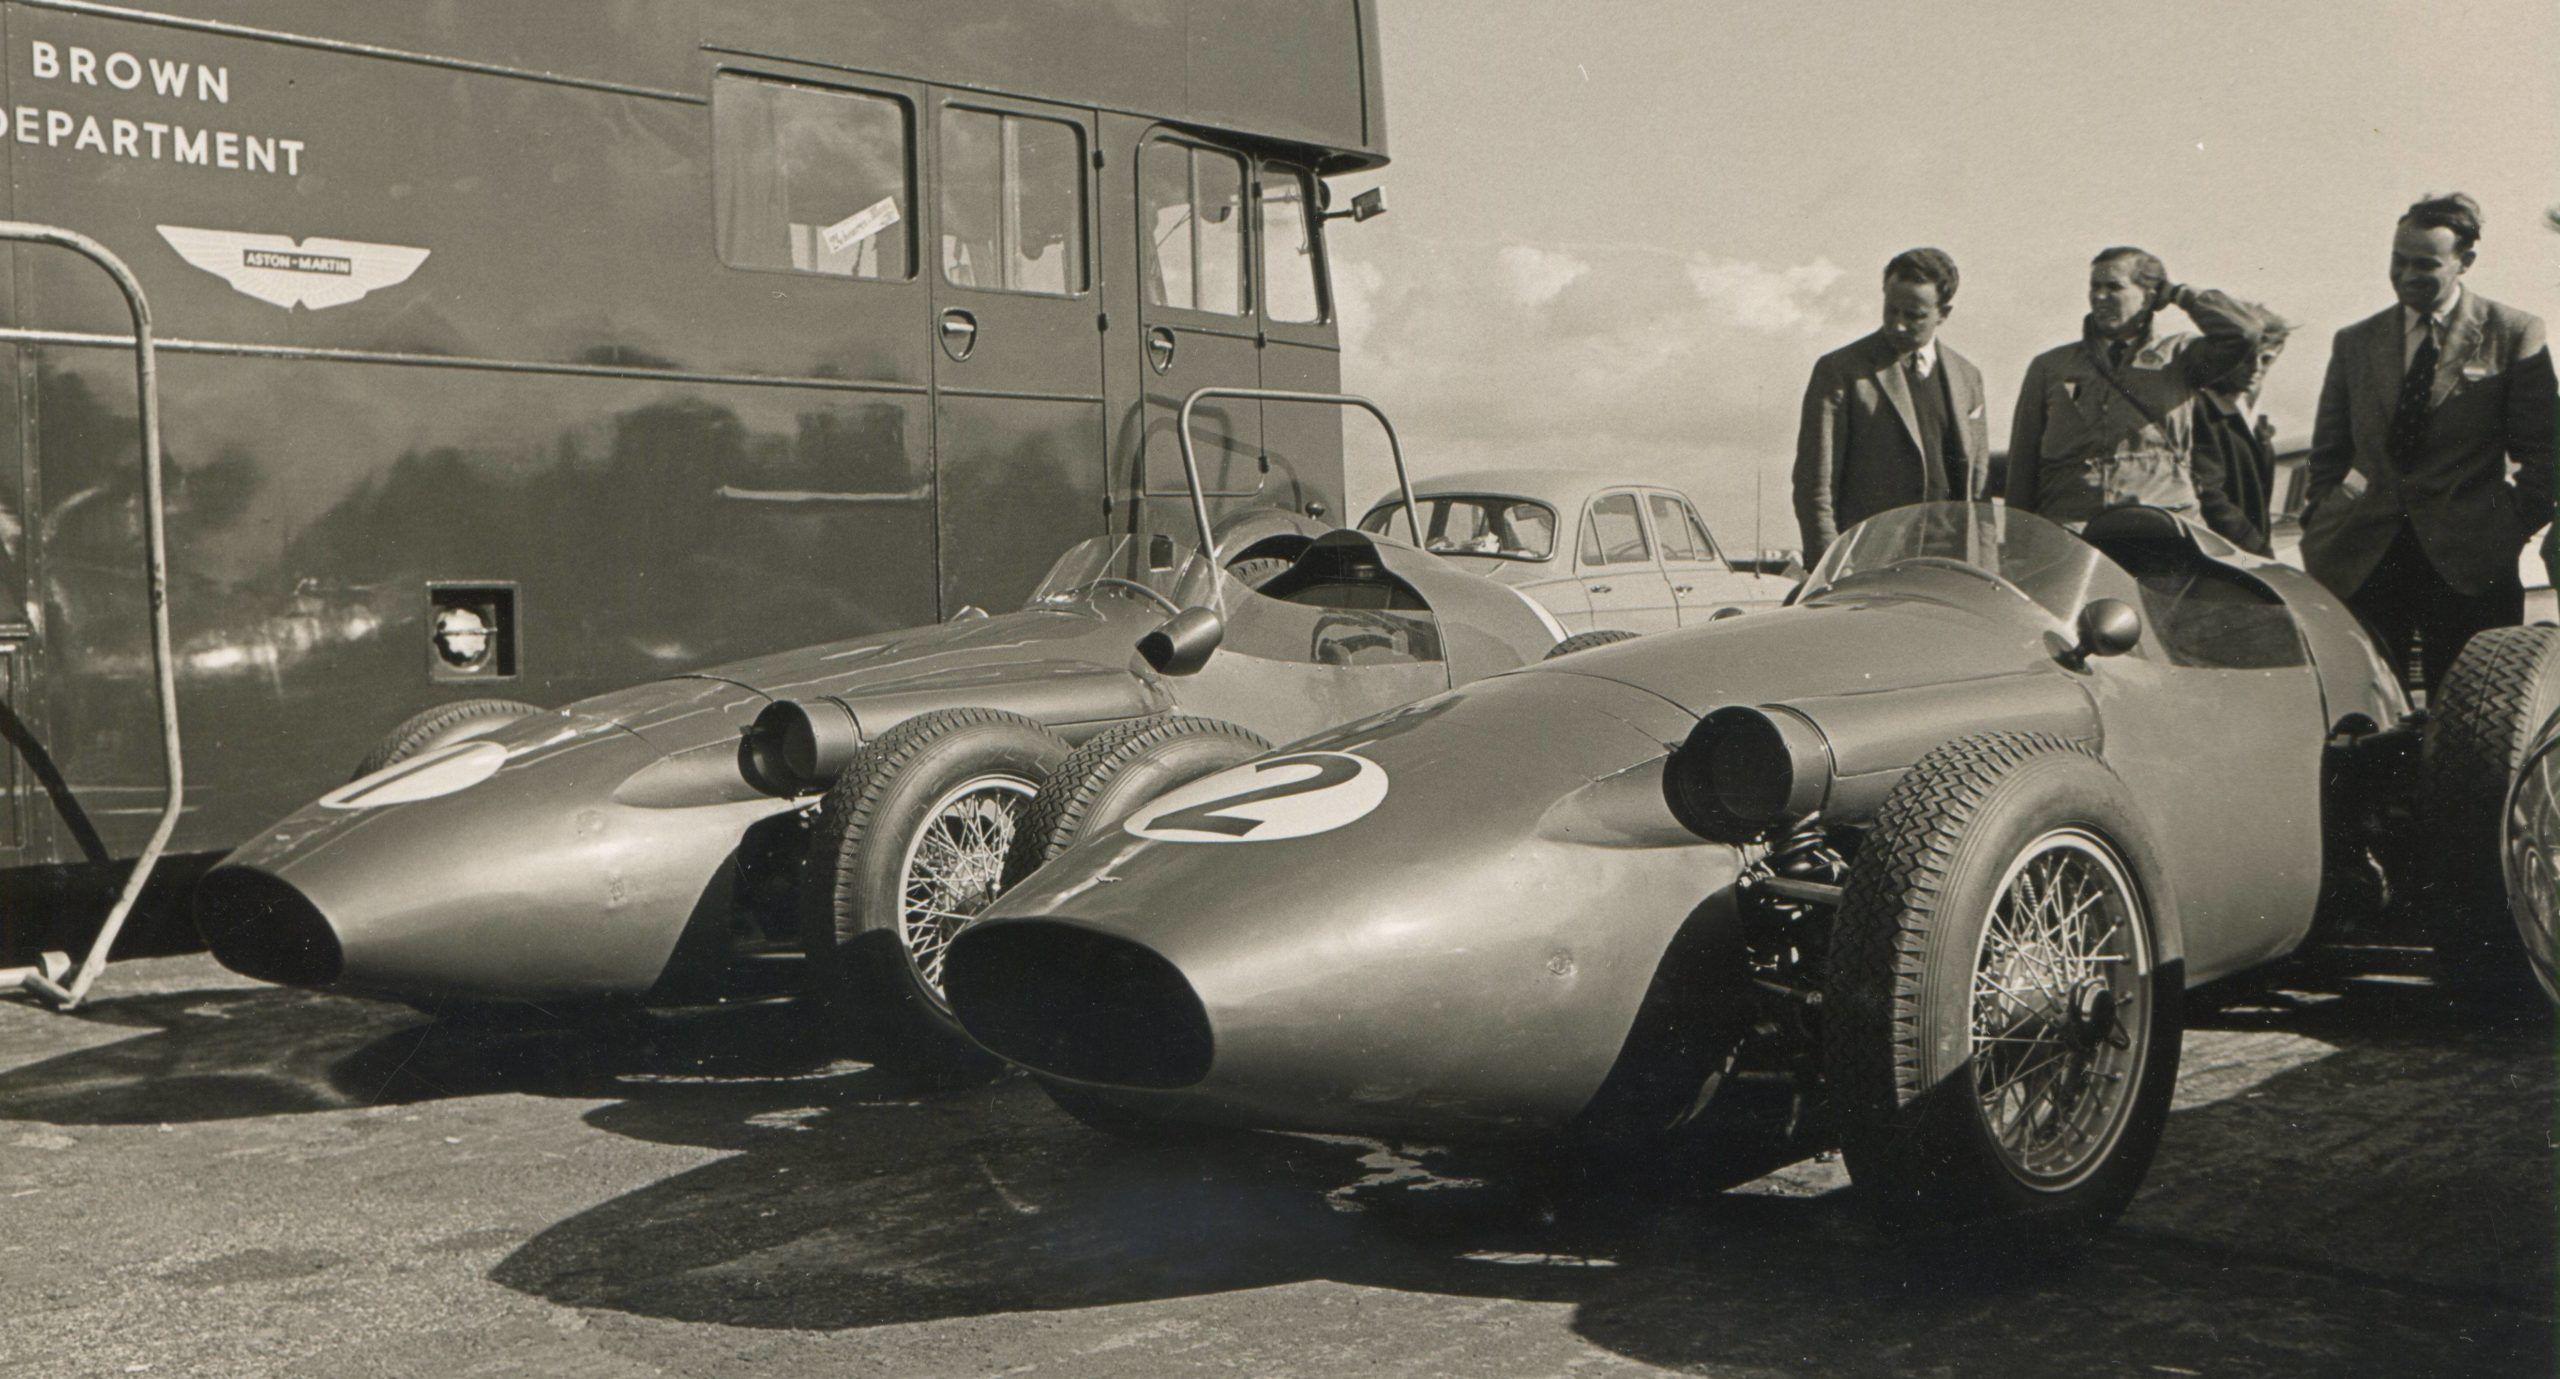 Lawrence Stroll, F1, Aston Martin